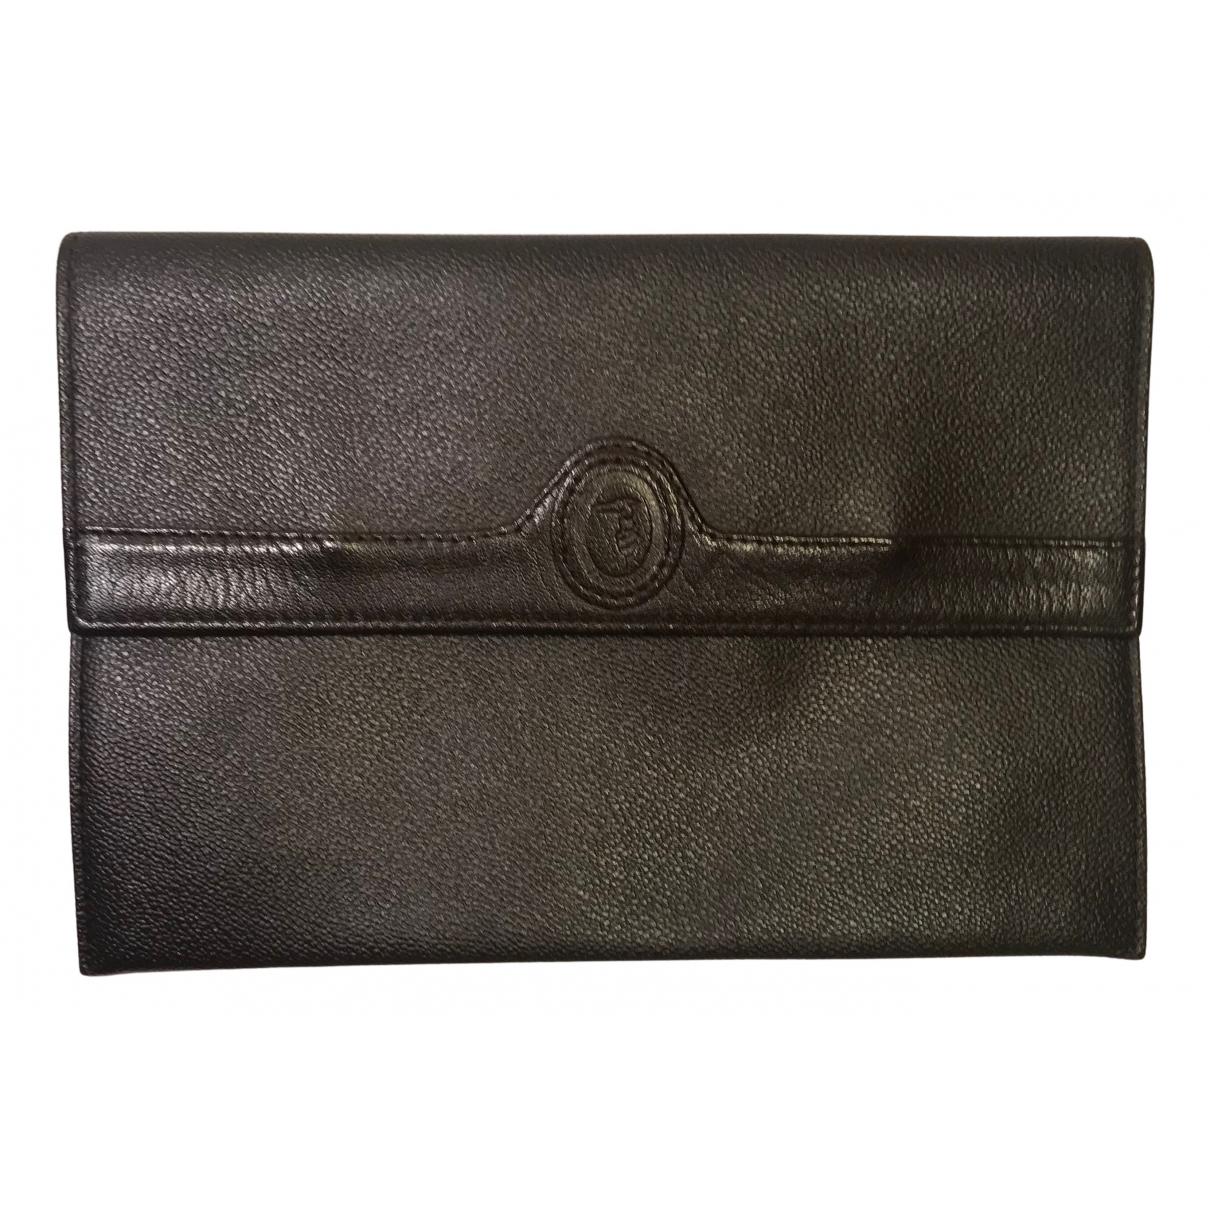 Trussardi N Brown Leather handbag for Women N